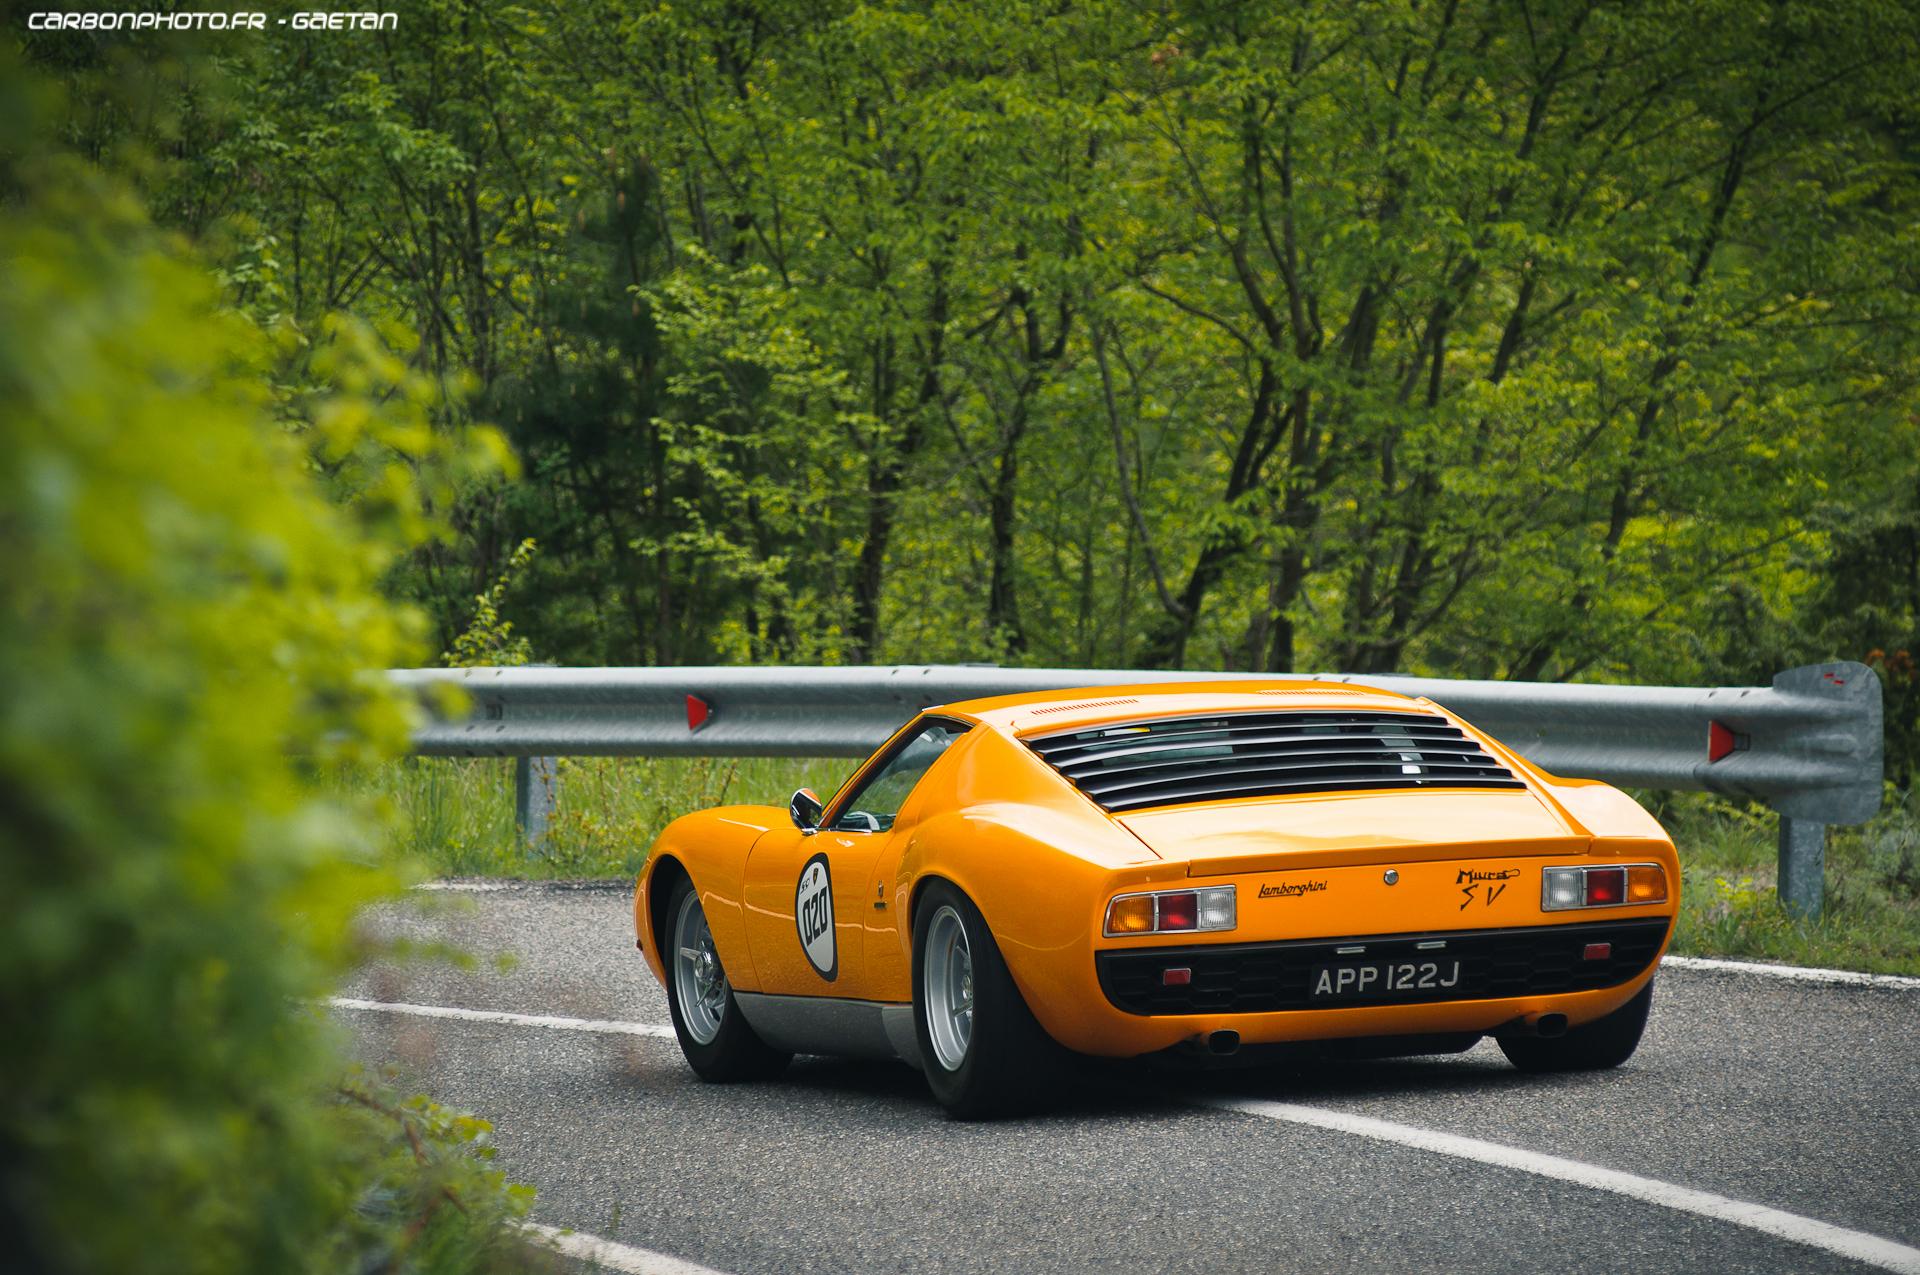 Fond D Ecran Italie Vehicule Jaune Orange Nikon Lamborghini